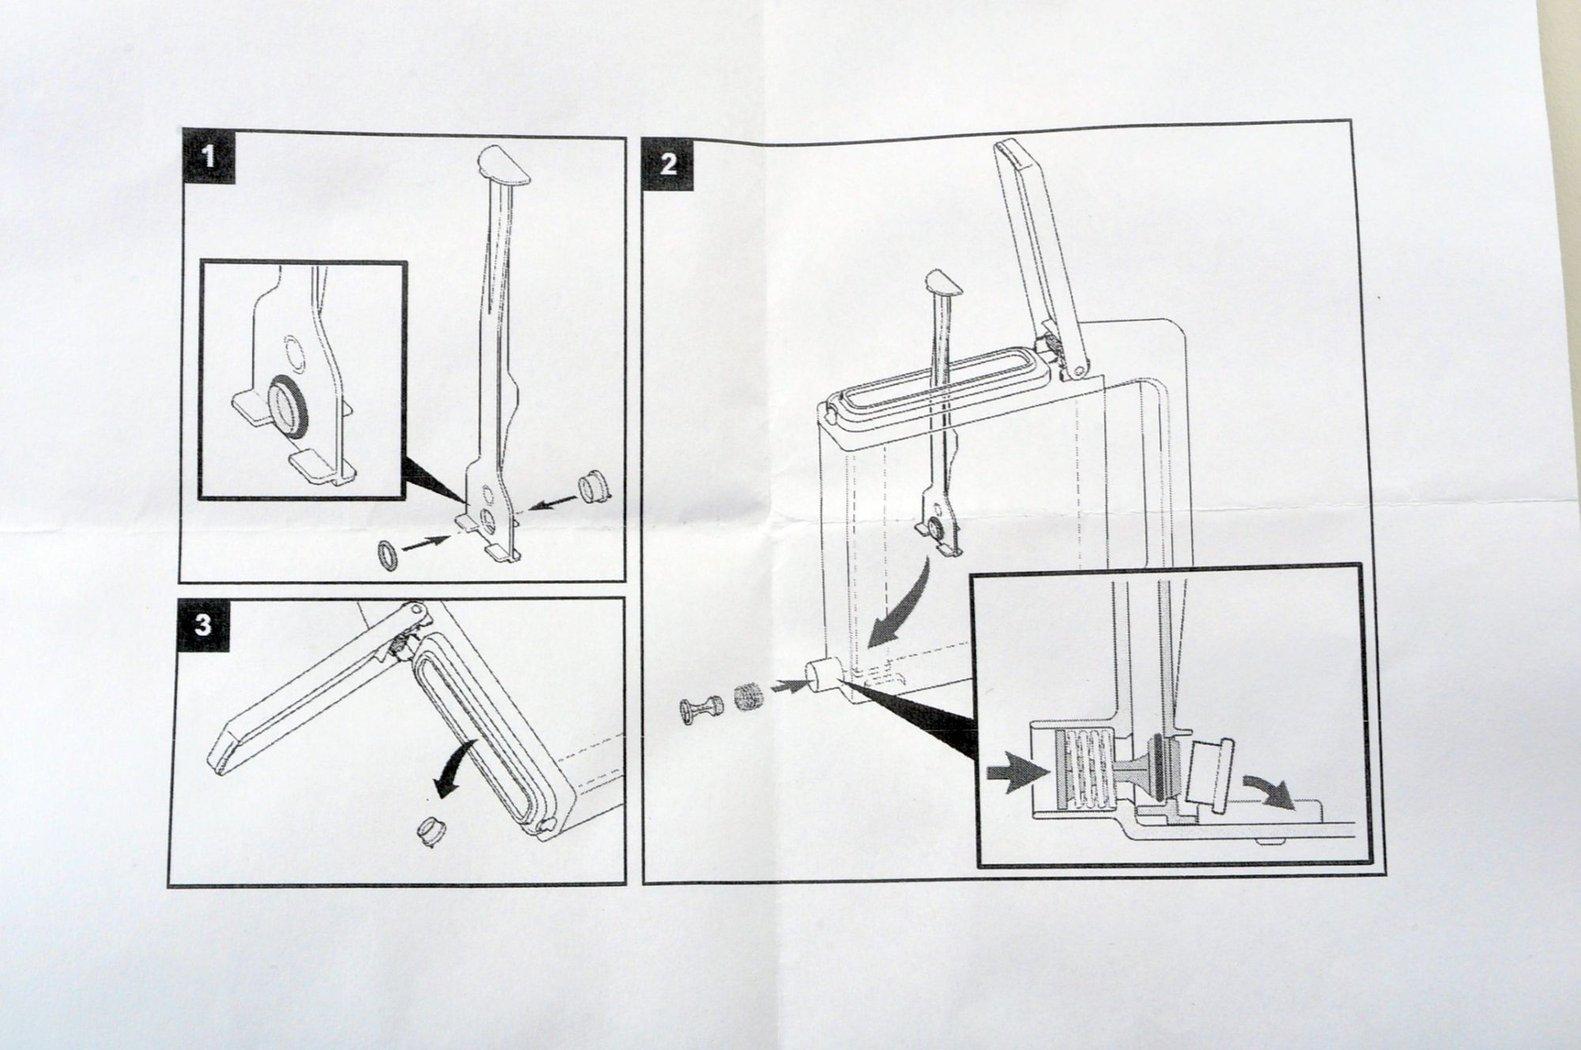 neff dampfgarer ventil wasser tank undicht multi reparatur satz. Black Bedroom Furniture Sets. Home Design Ideas